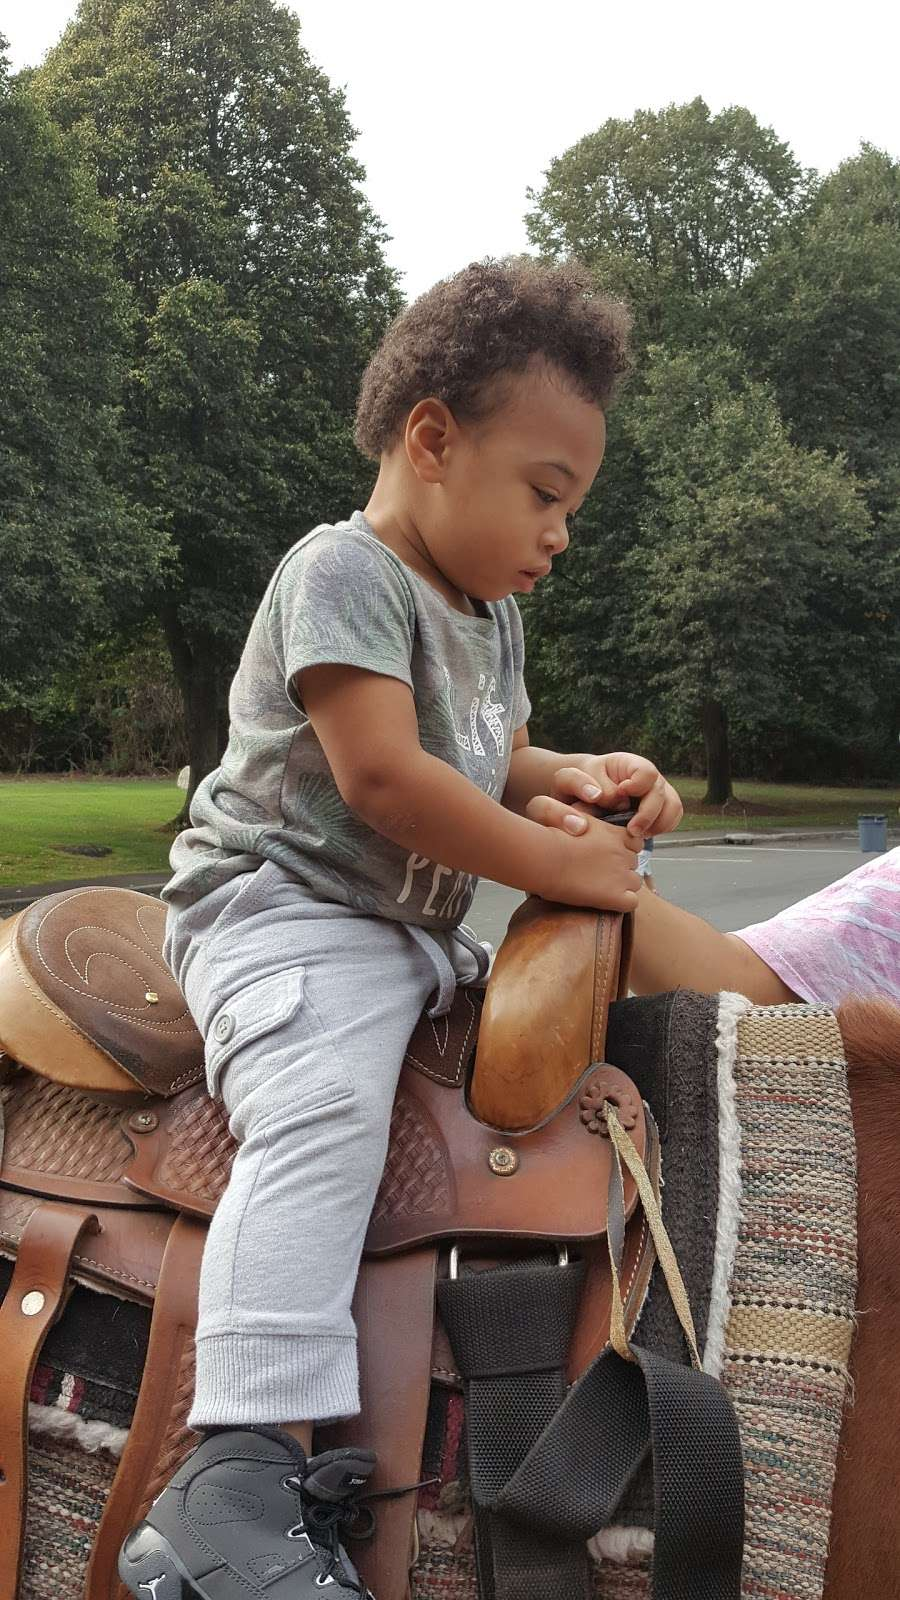 Breed Park - park  | Photo 8 of 10 | Address: Lynn, MA 01905, USA